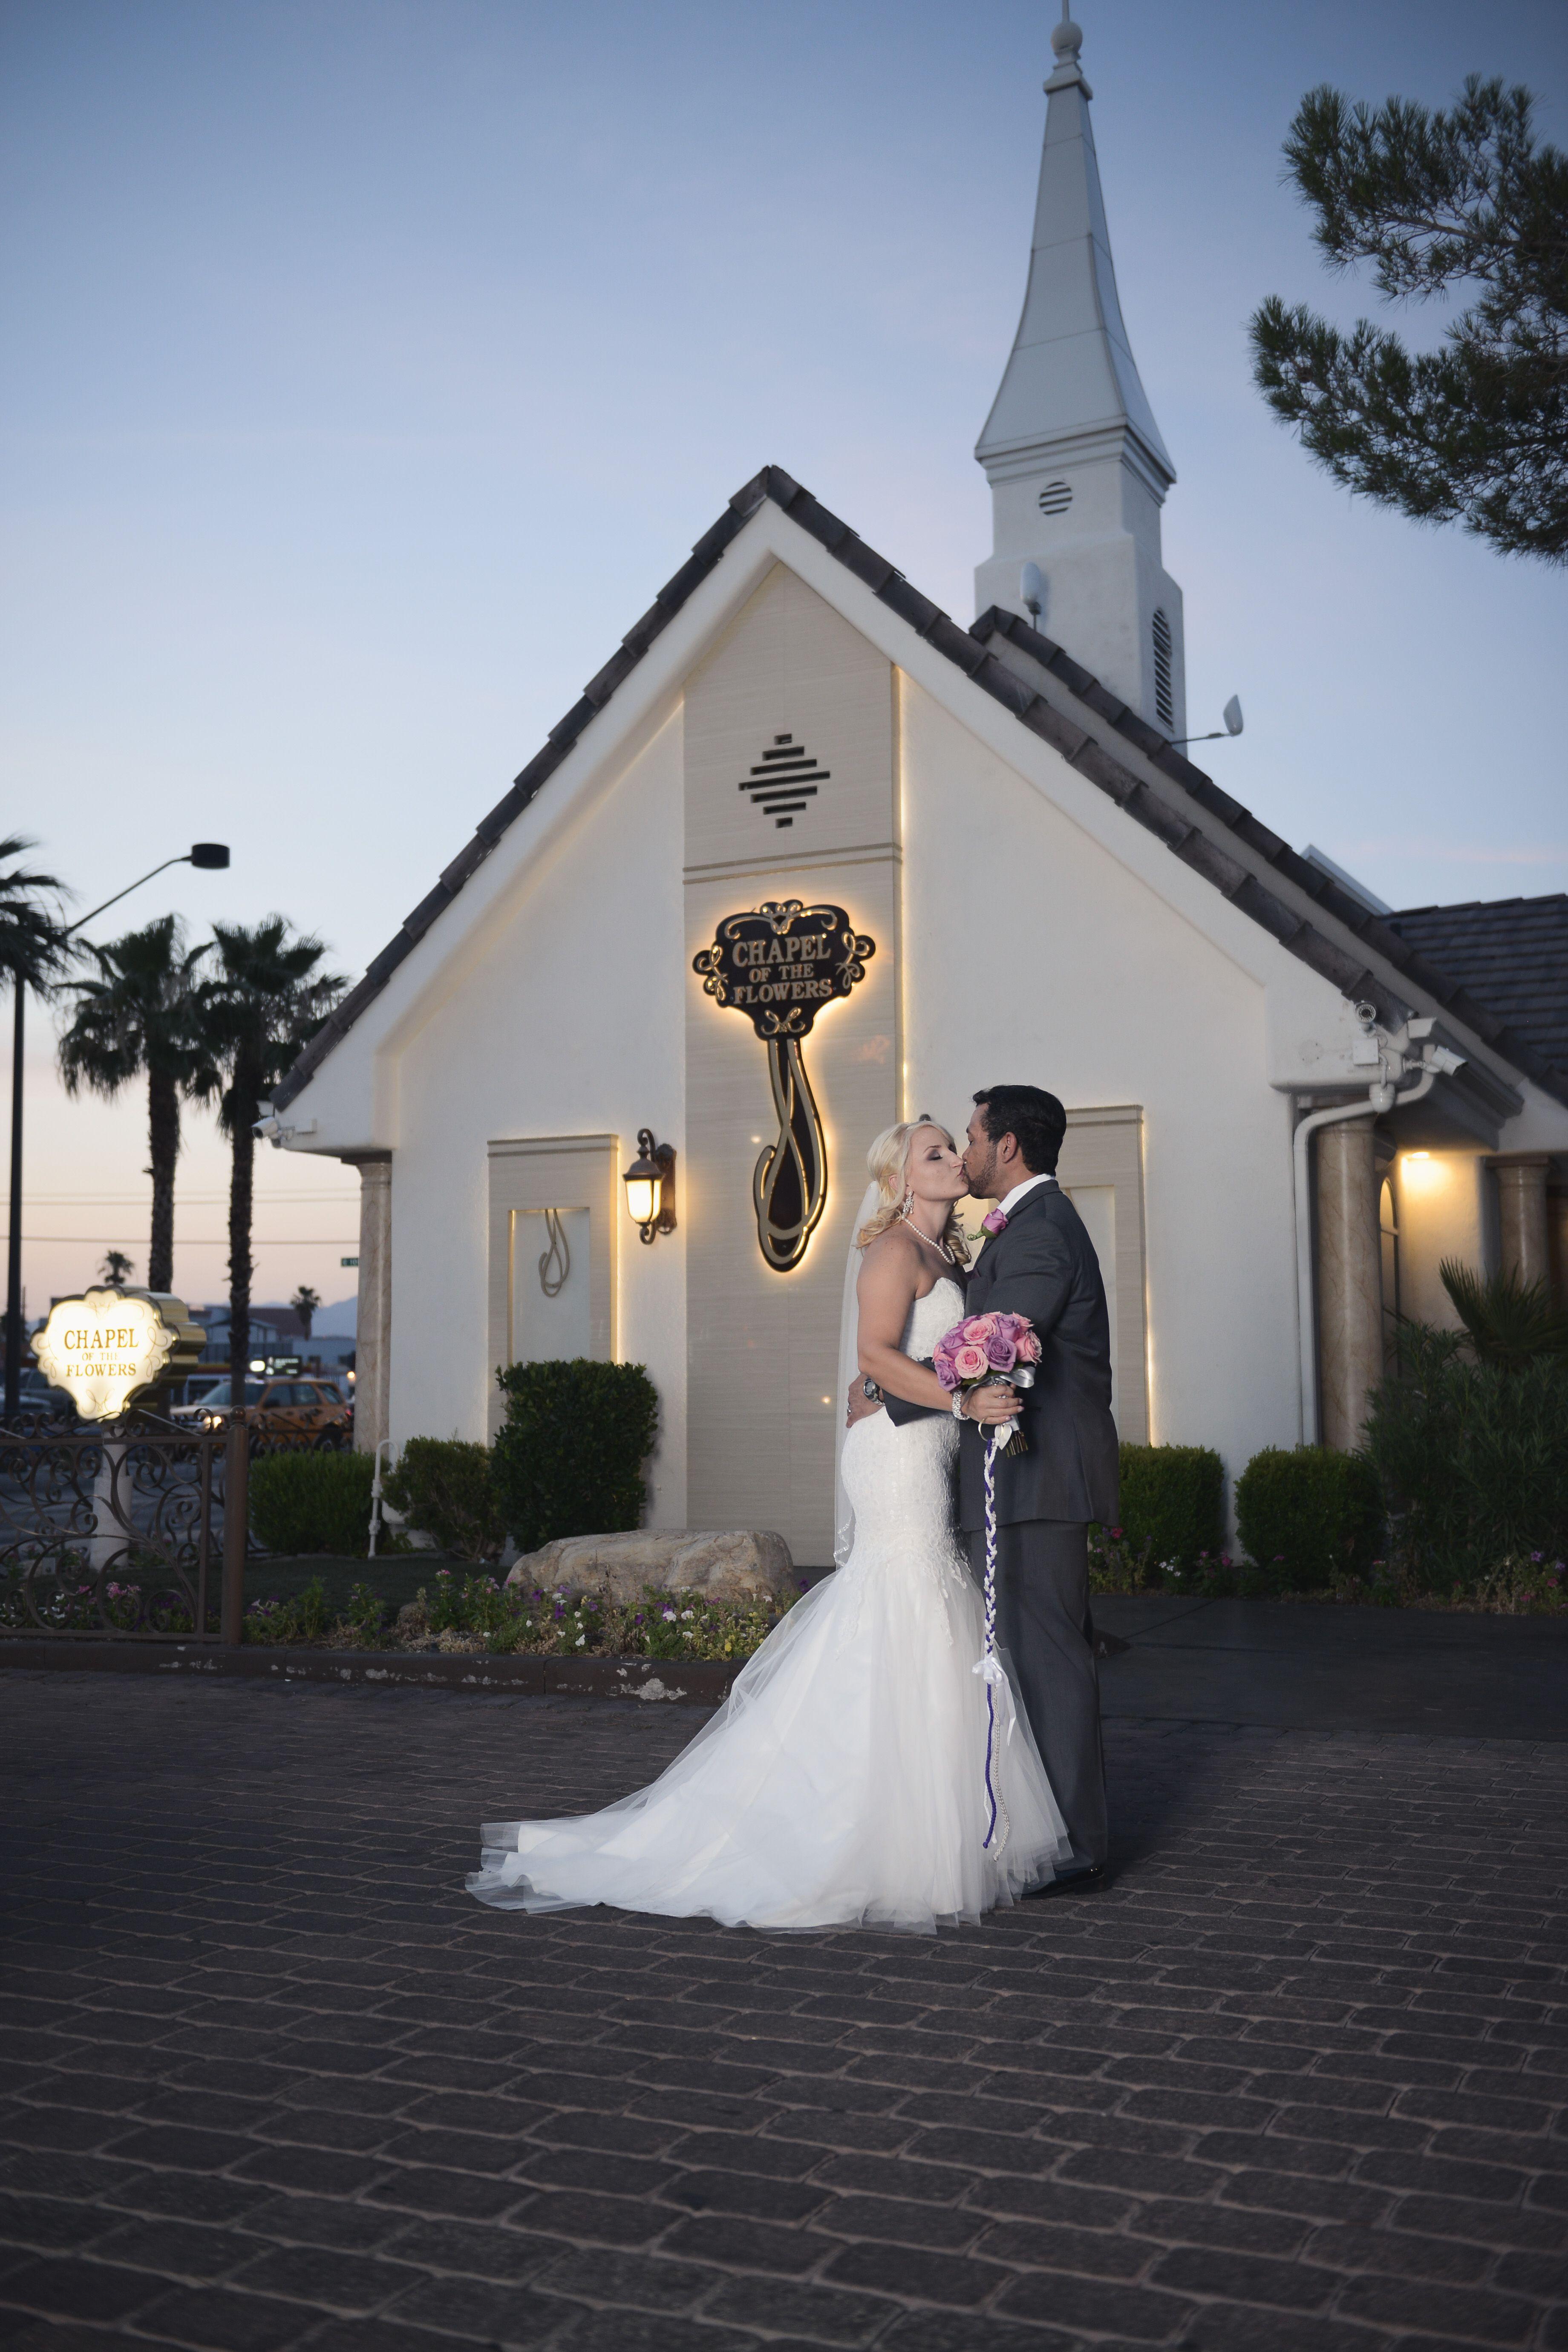 Chapel Of The Flowers Victorian Chapel Las Vegas Wedding Chapel Traditional Vegas C Las Vegas Wedding Chapel Vegas Wedding Wedding Chapel Ideas